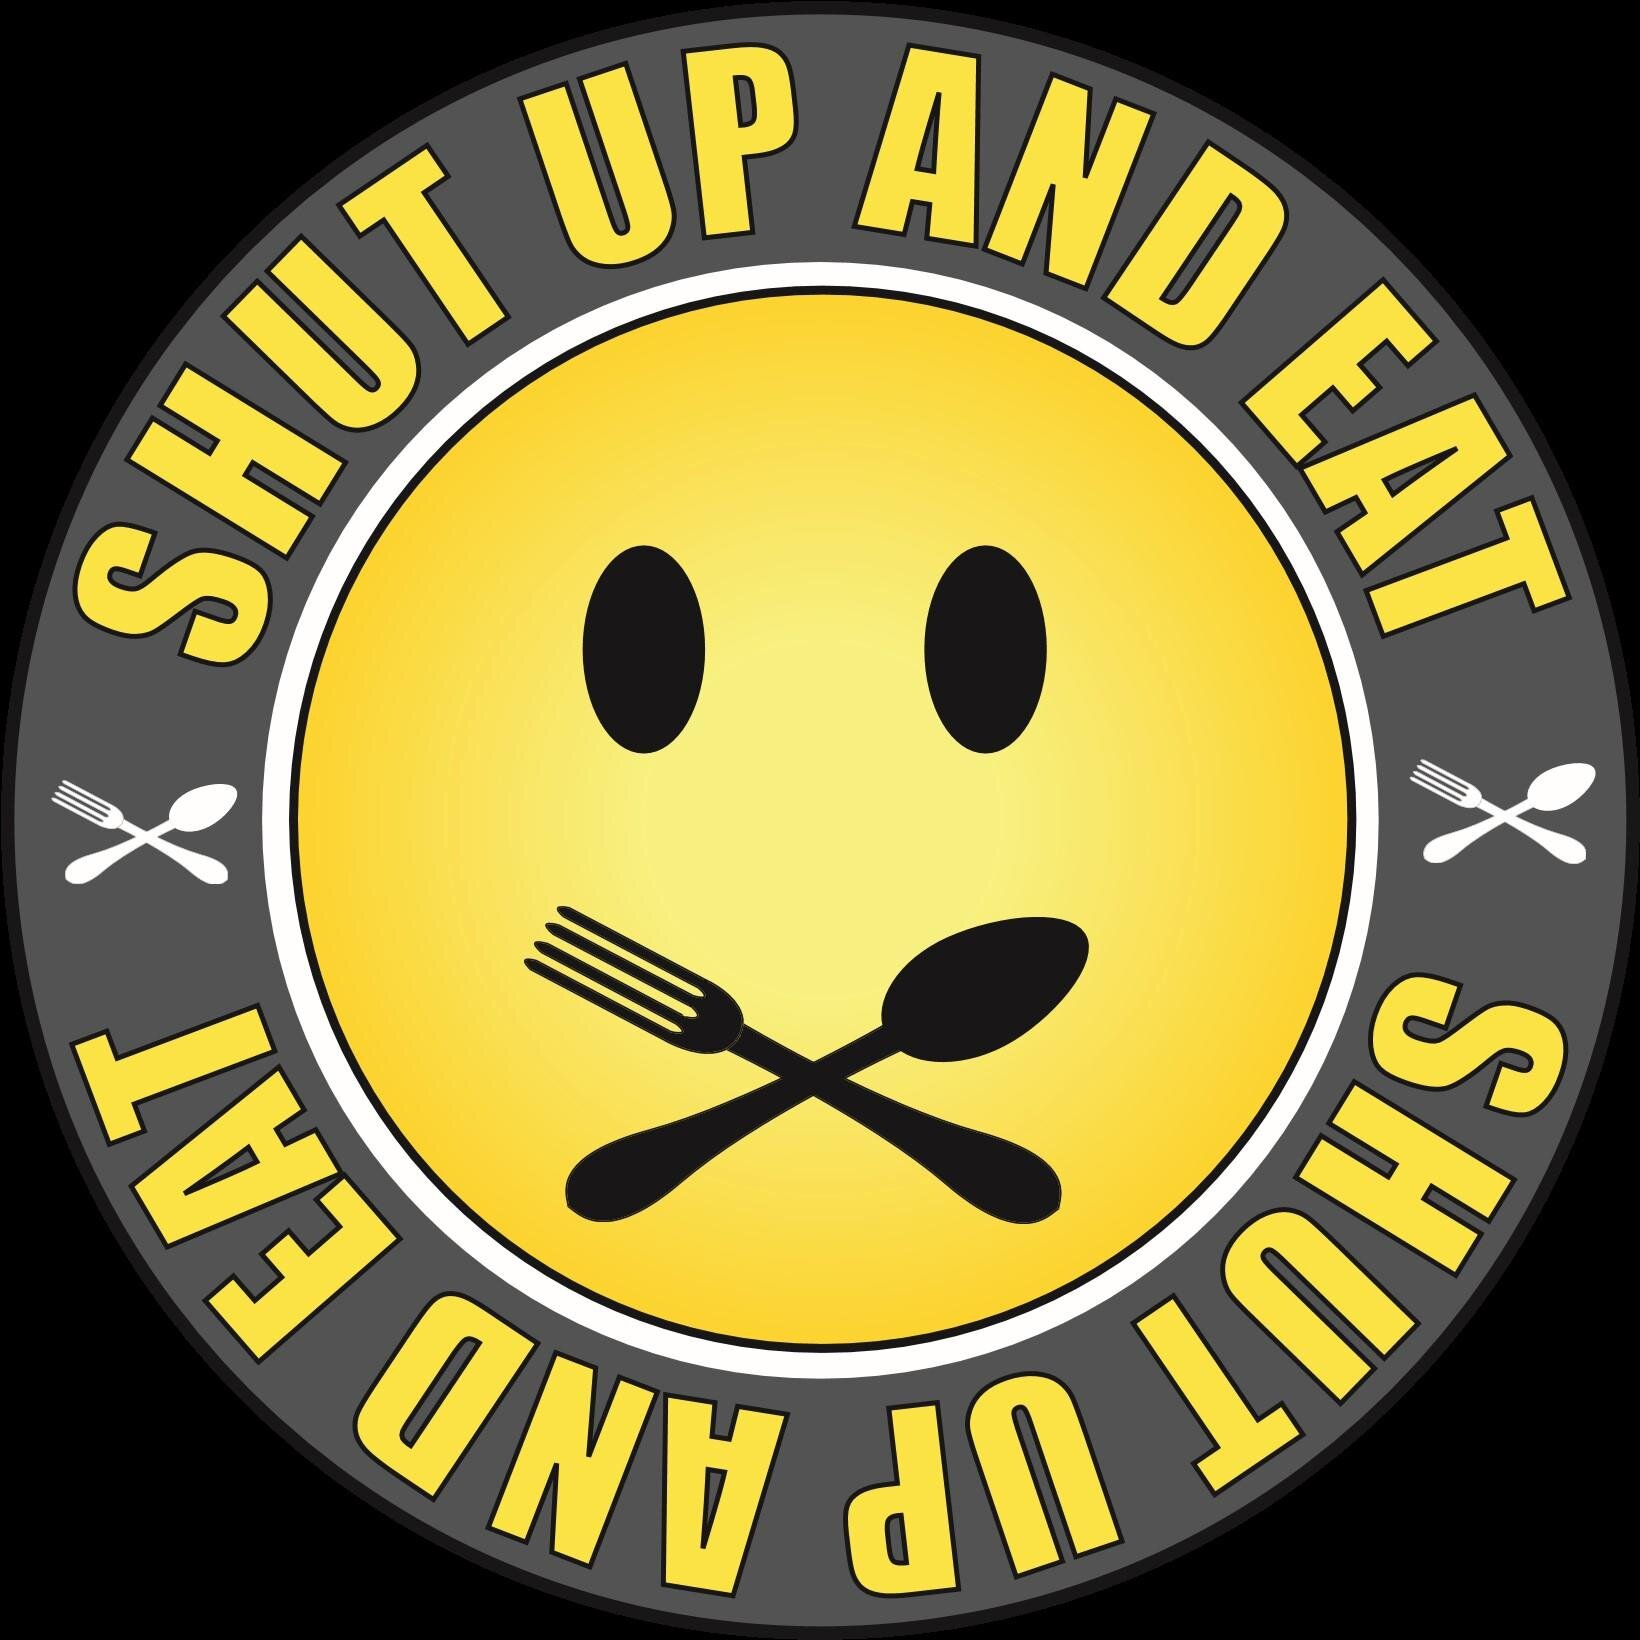 Shut Up and Eat logo